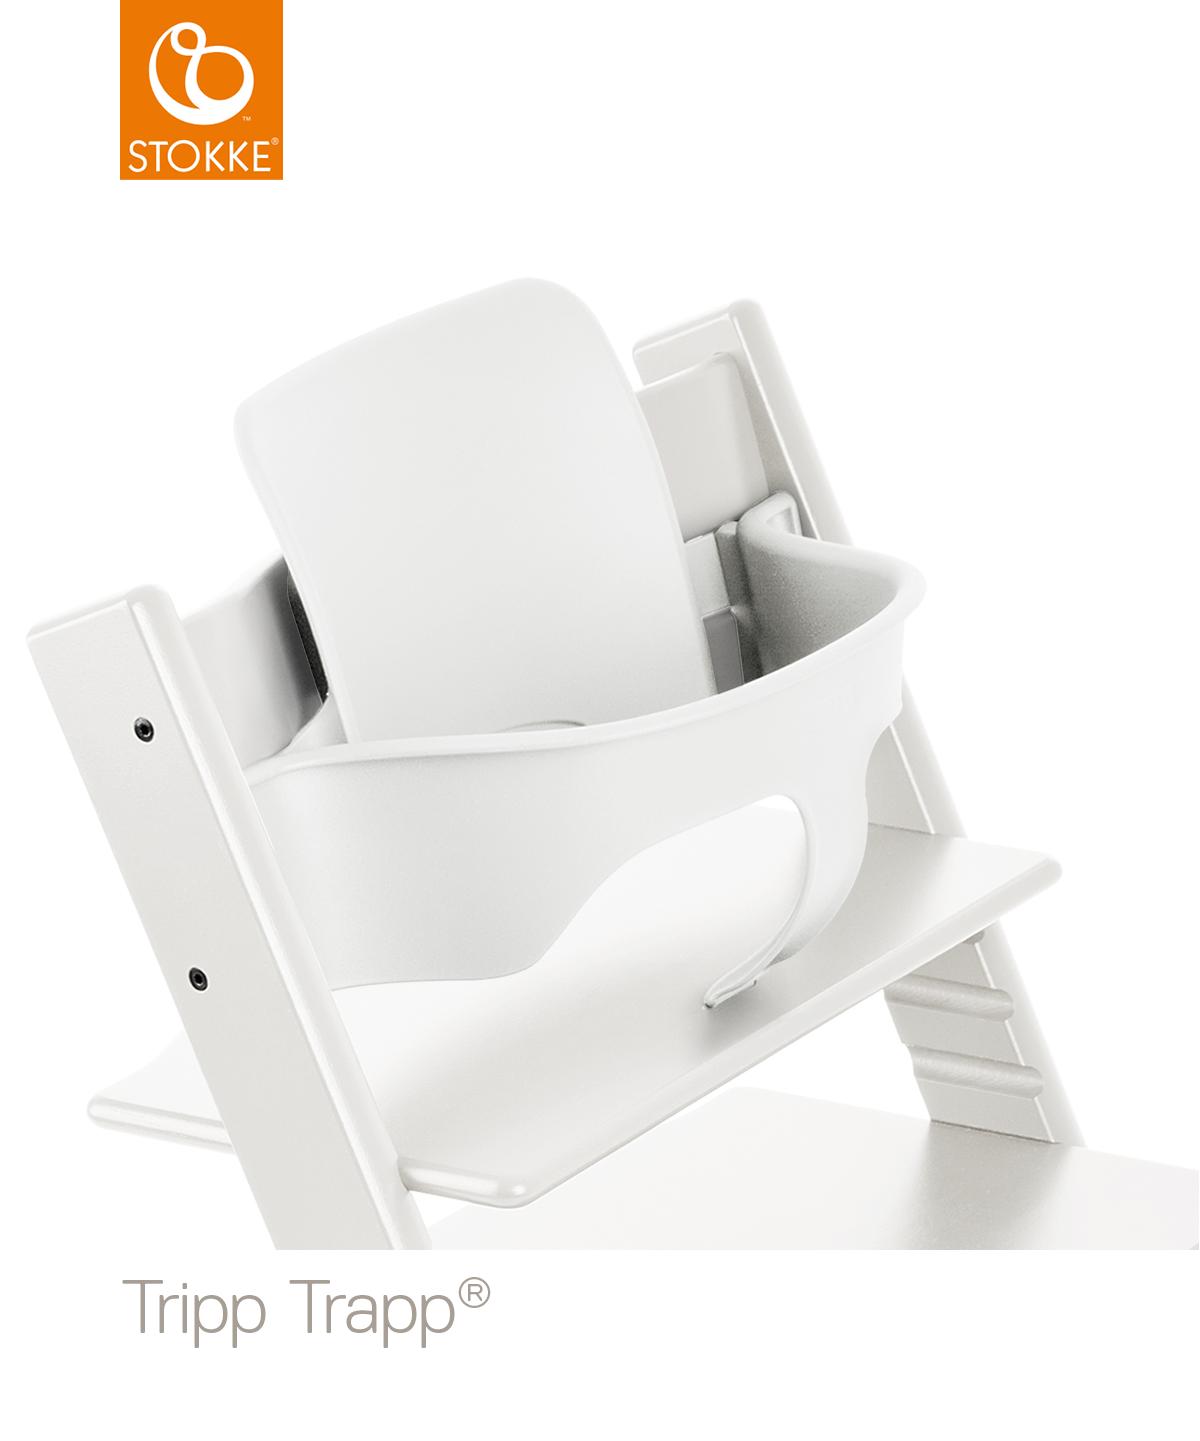 Stokke Kinderstoel Aanbieding.Stokke Tripp Trapp White Incl Babyset